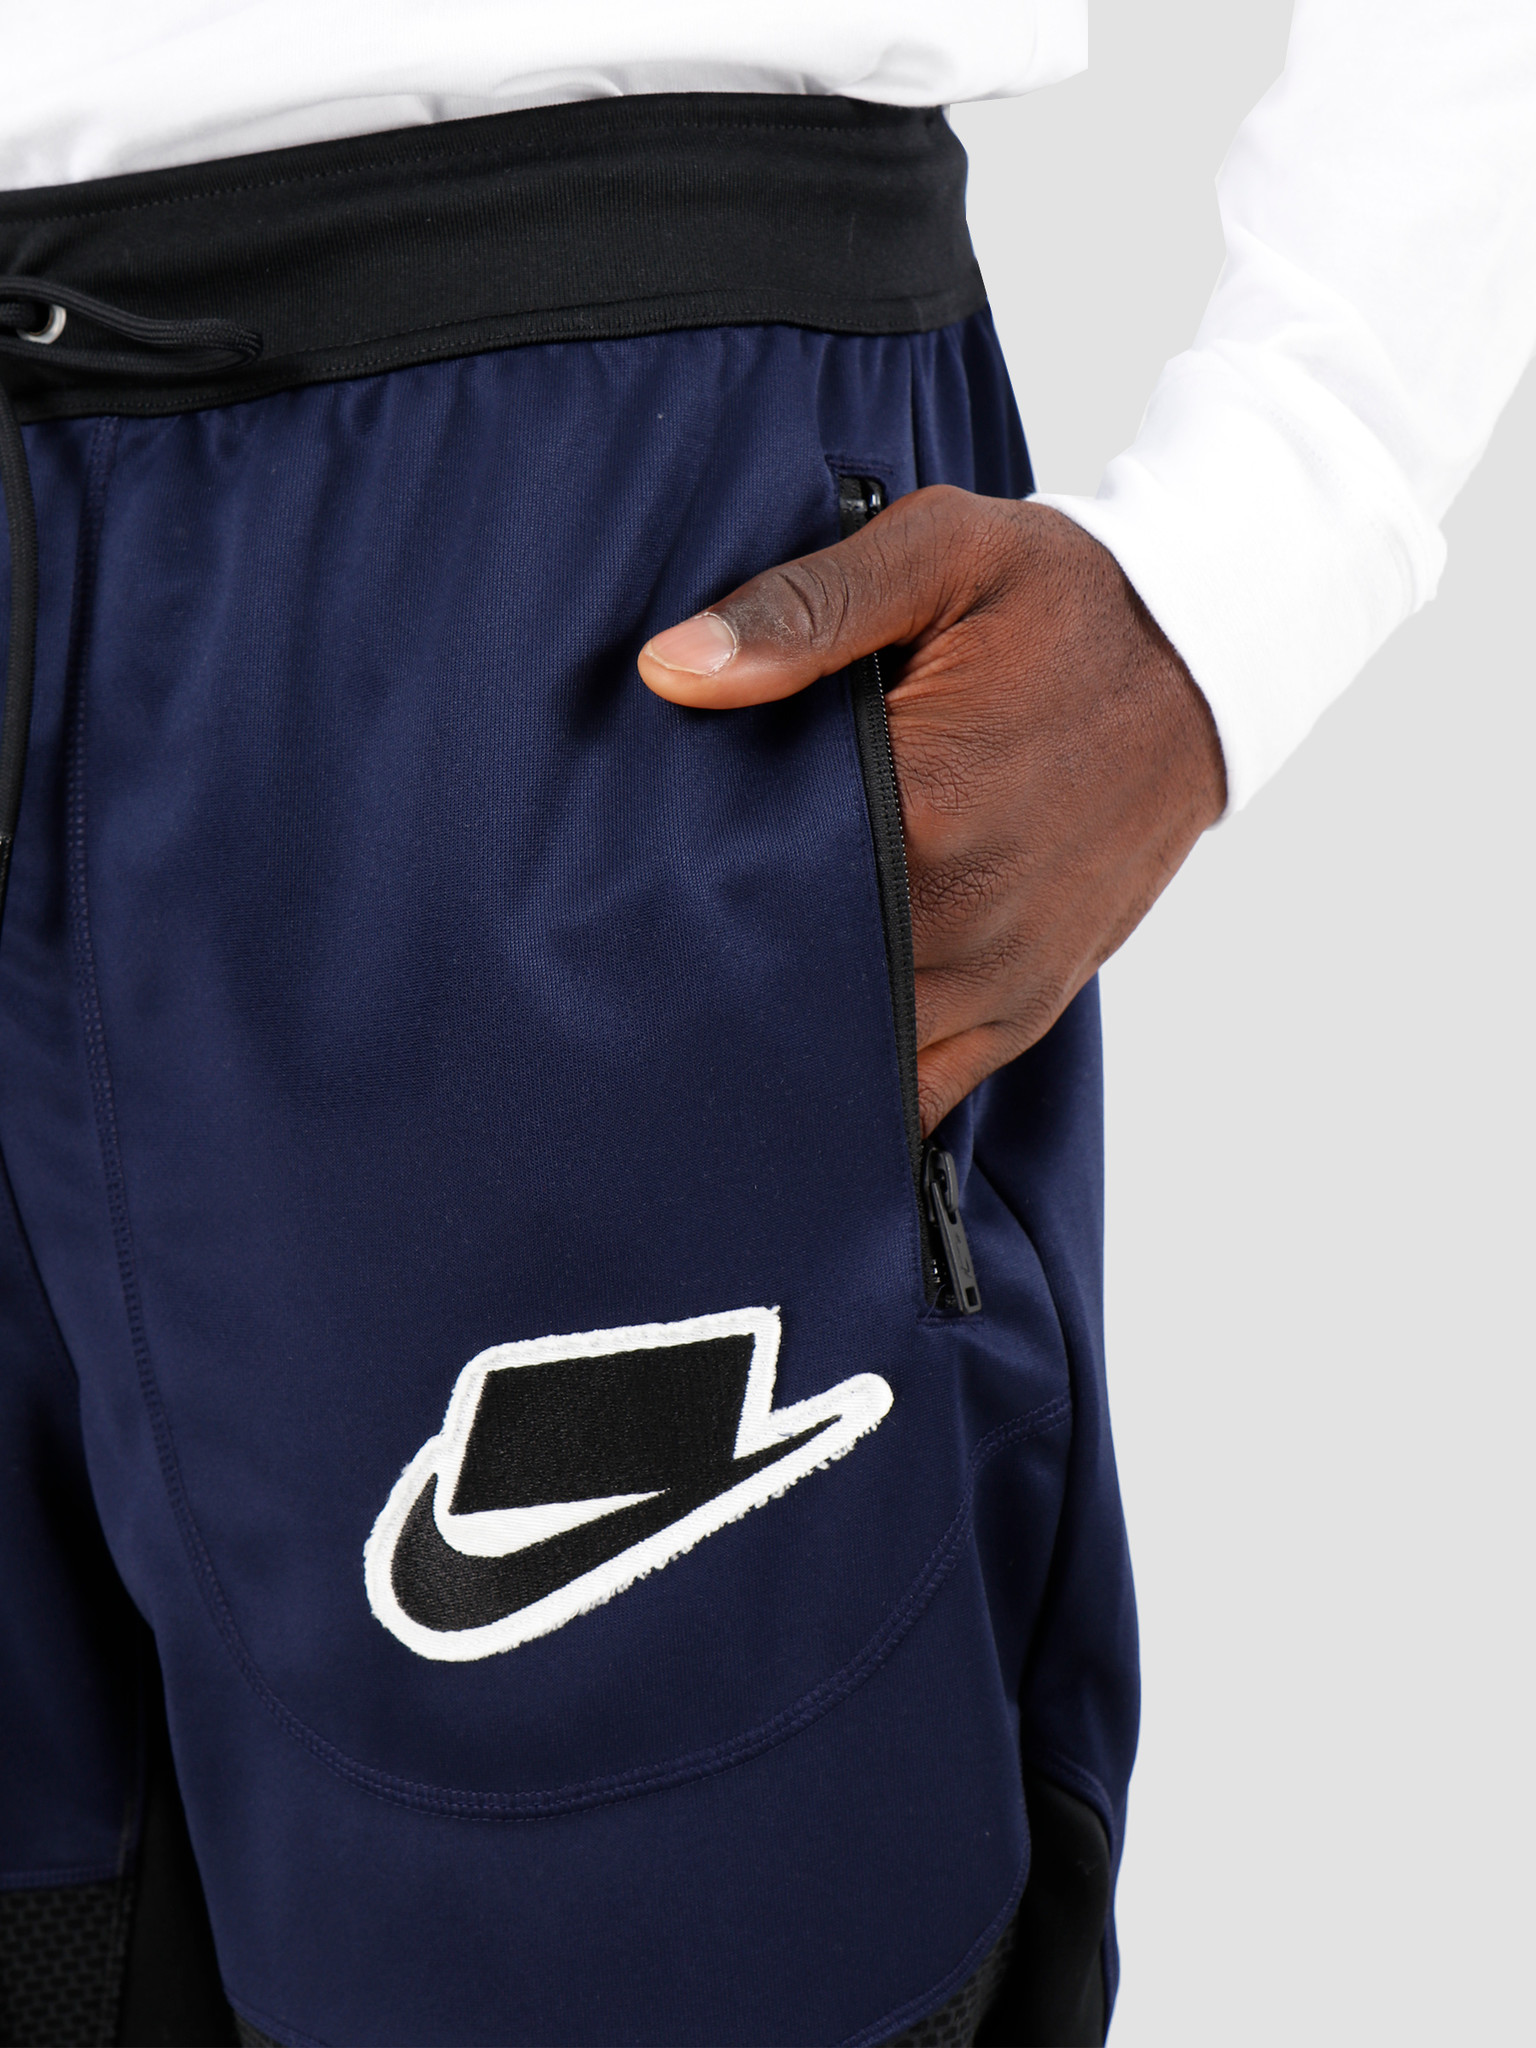 Nike Nike NSW Nsp Track Pant Pk Bodyap Blackened Blue Off Noir Black Black BV4550-498